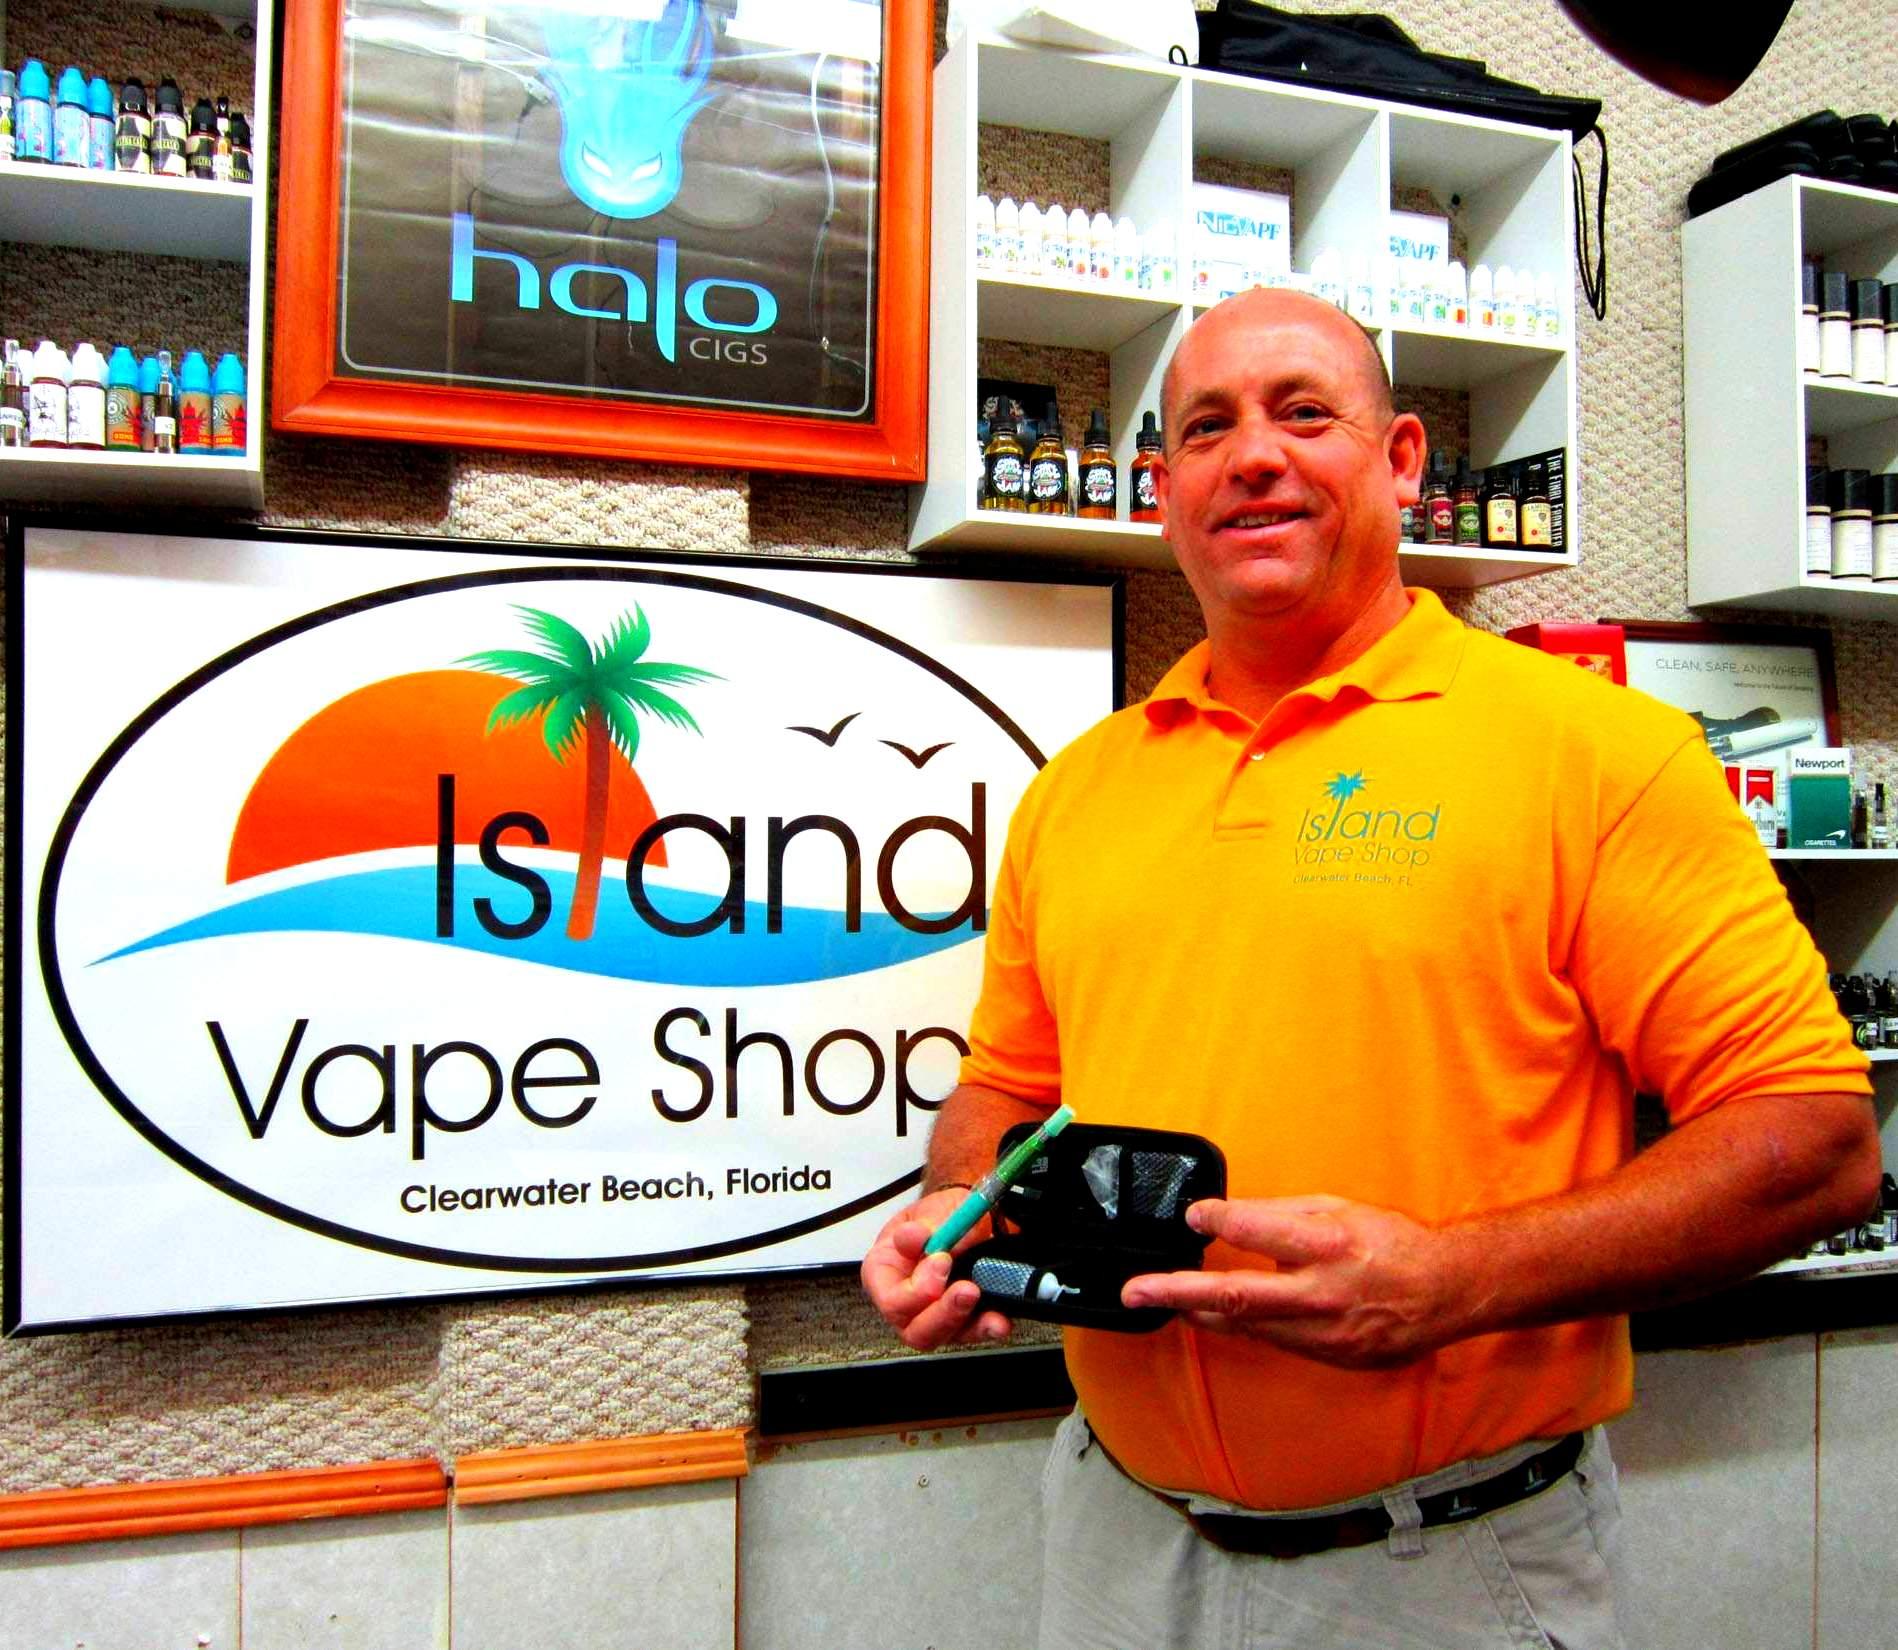 island_vape_shop_clearwater_beach_florida.jpg